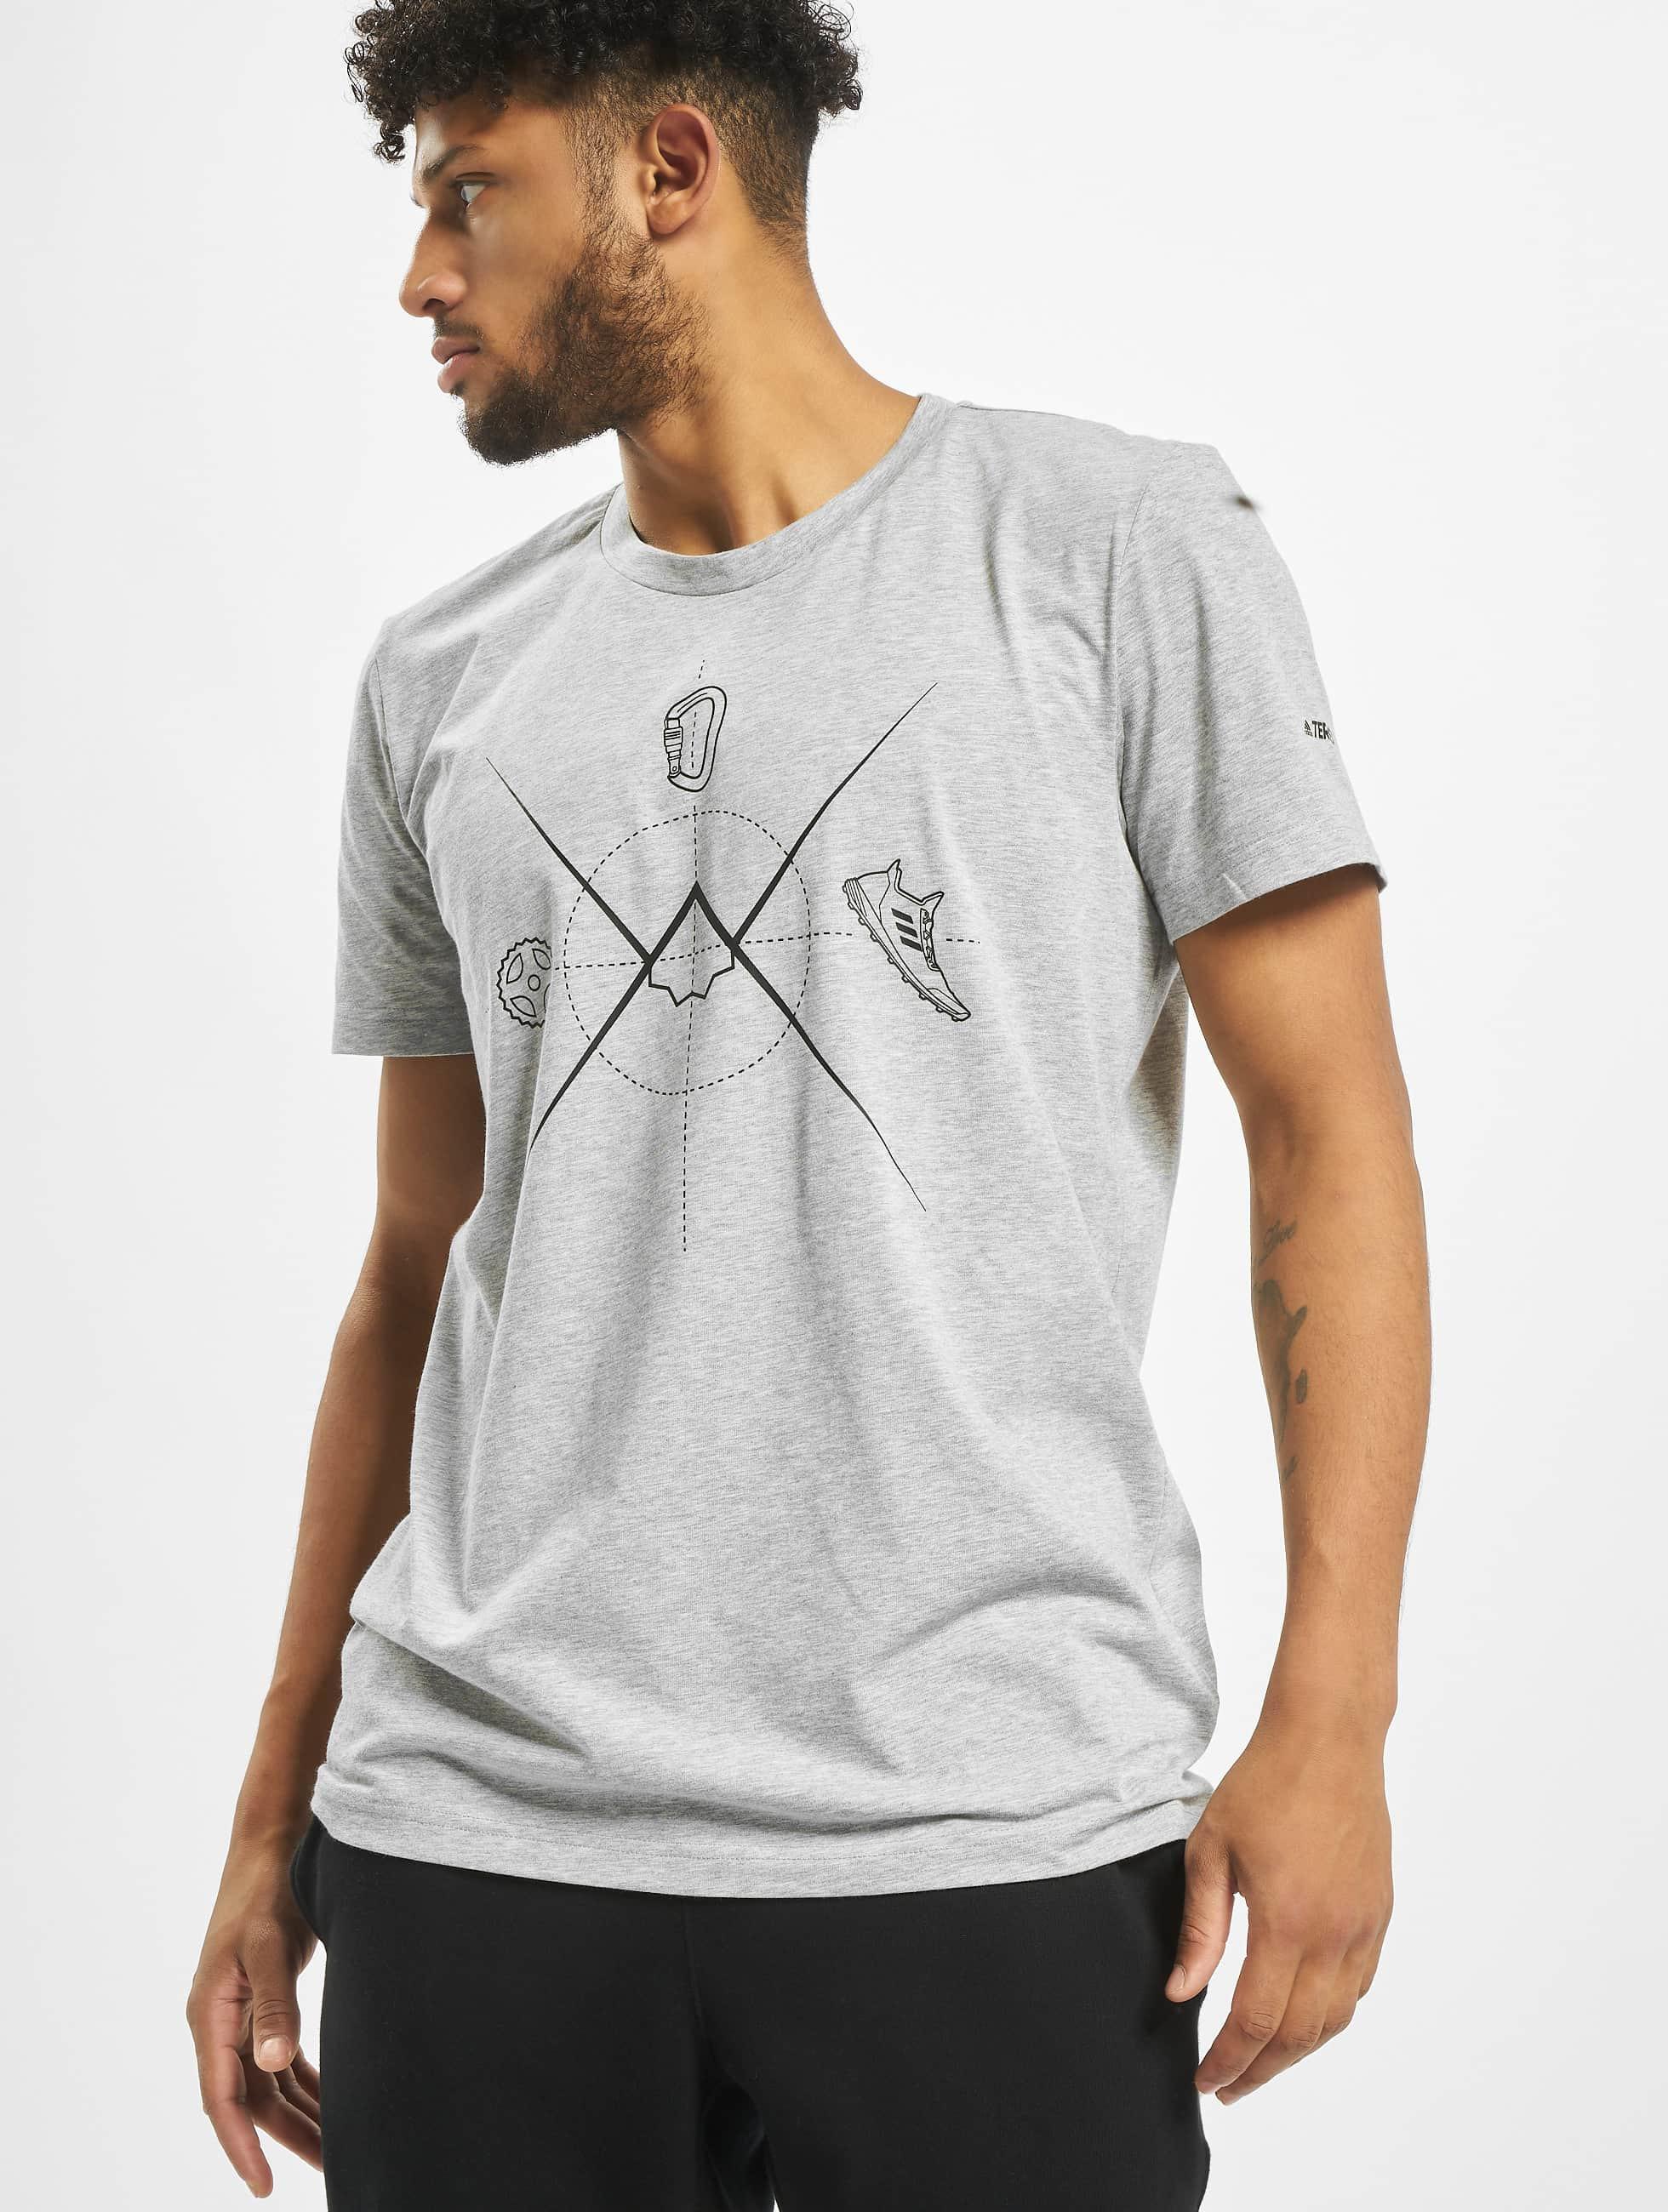 adidas Originals Herren T-Shirt Ascend in grau 713574